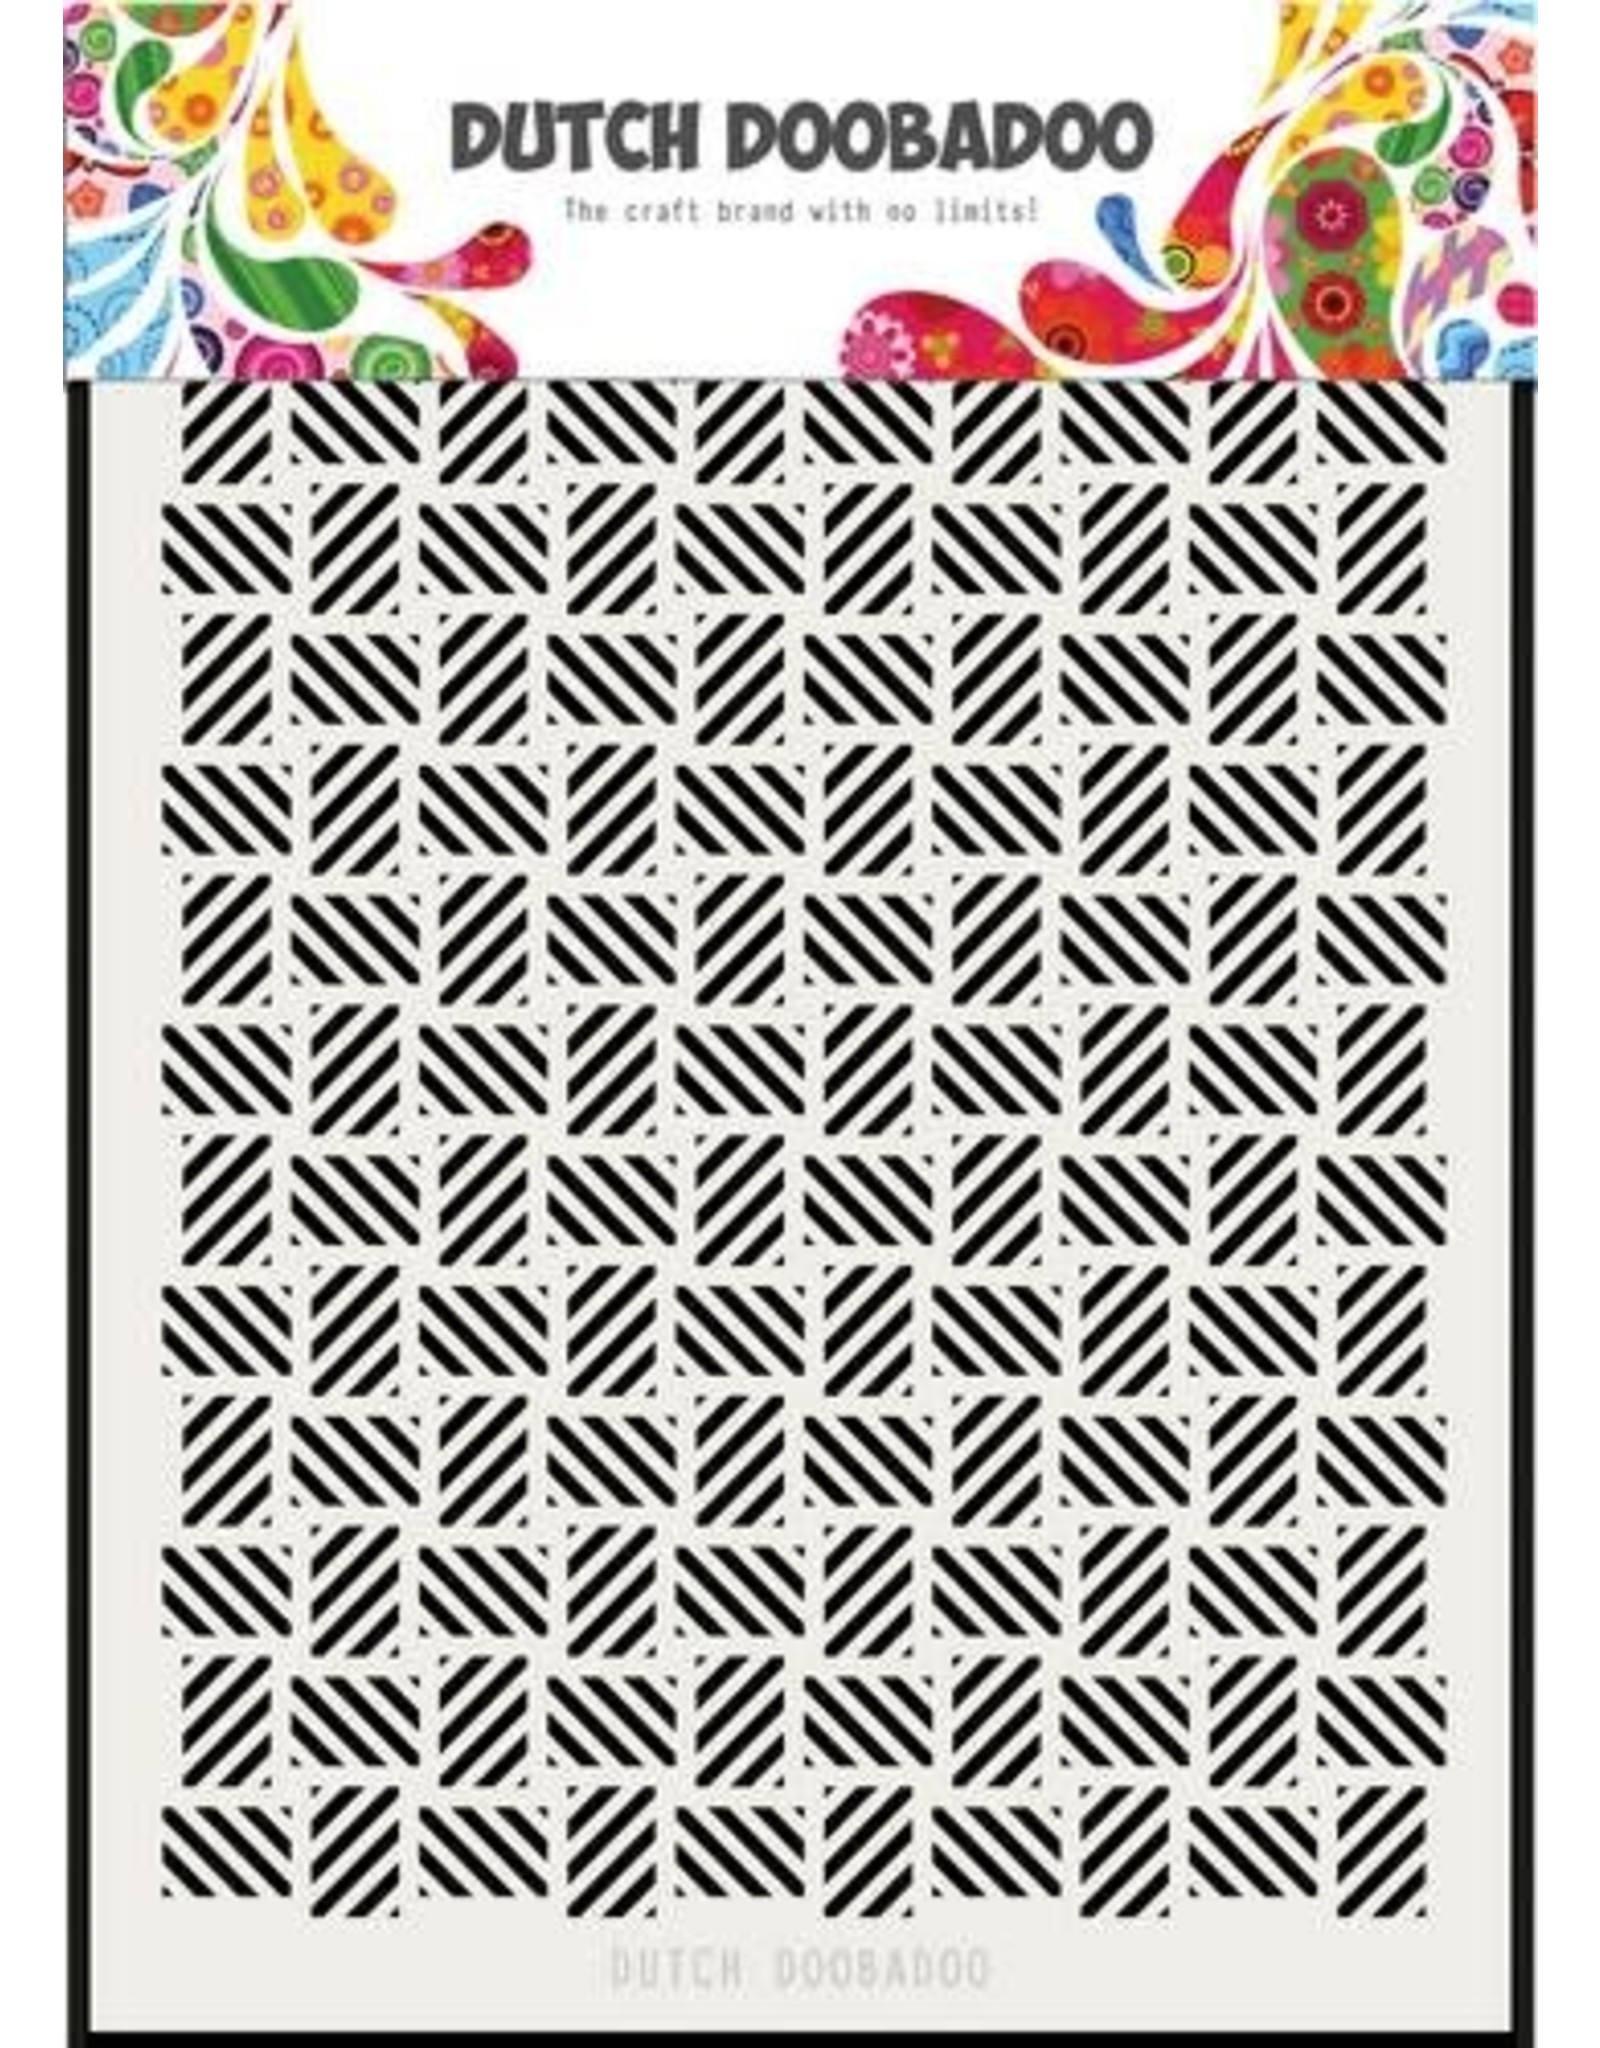 Dutch Doobadoo Dutch Doobadoo Dutch Mask Art stripe pattern los A5 470.715.134